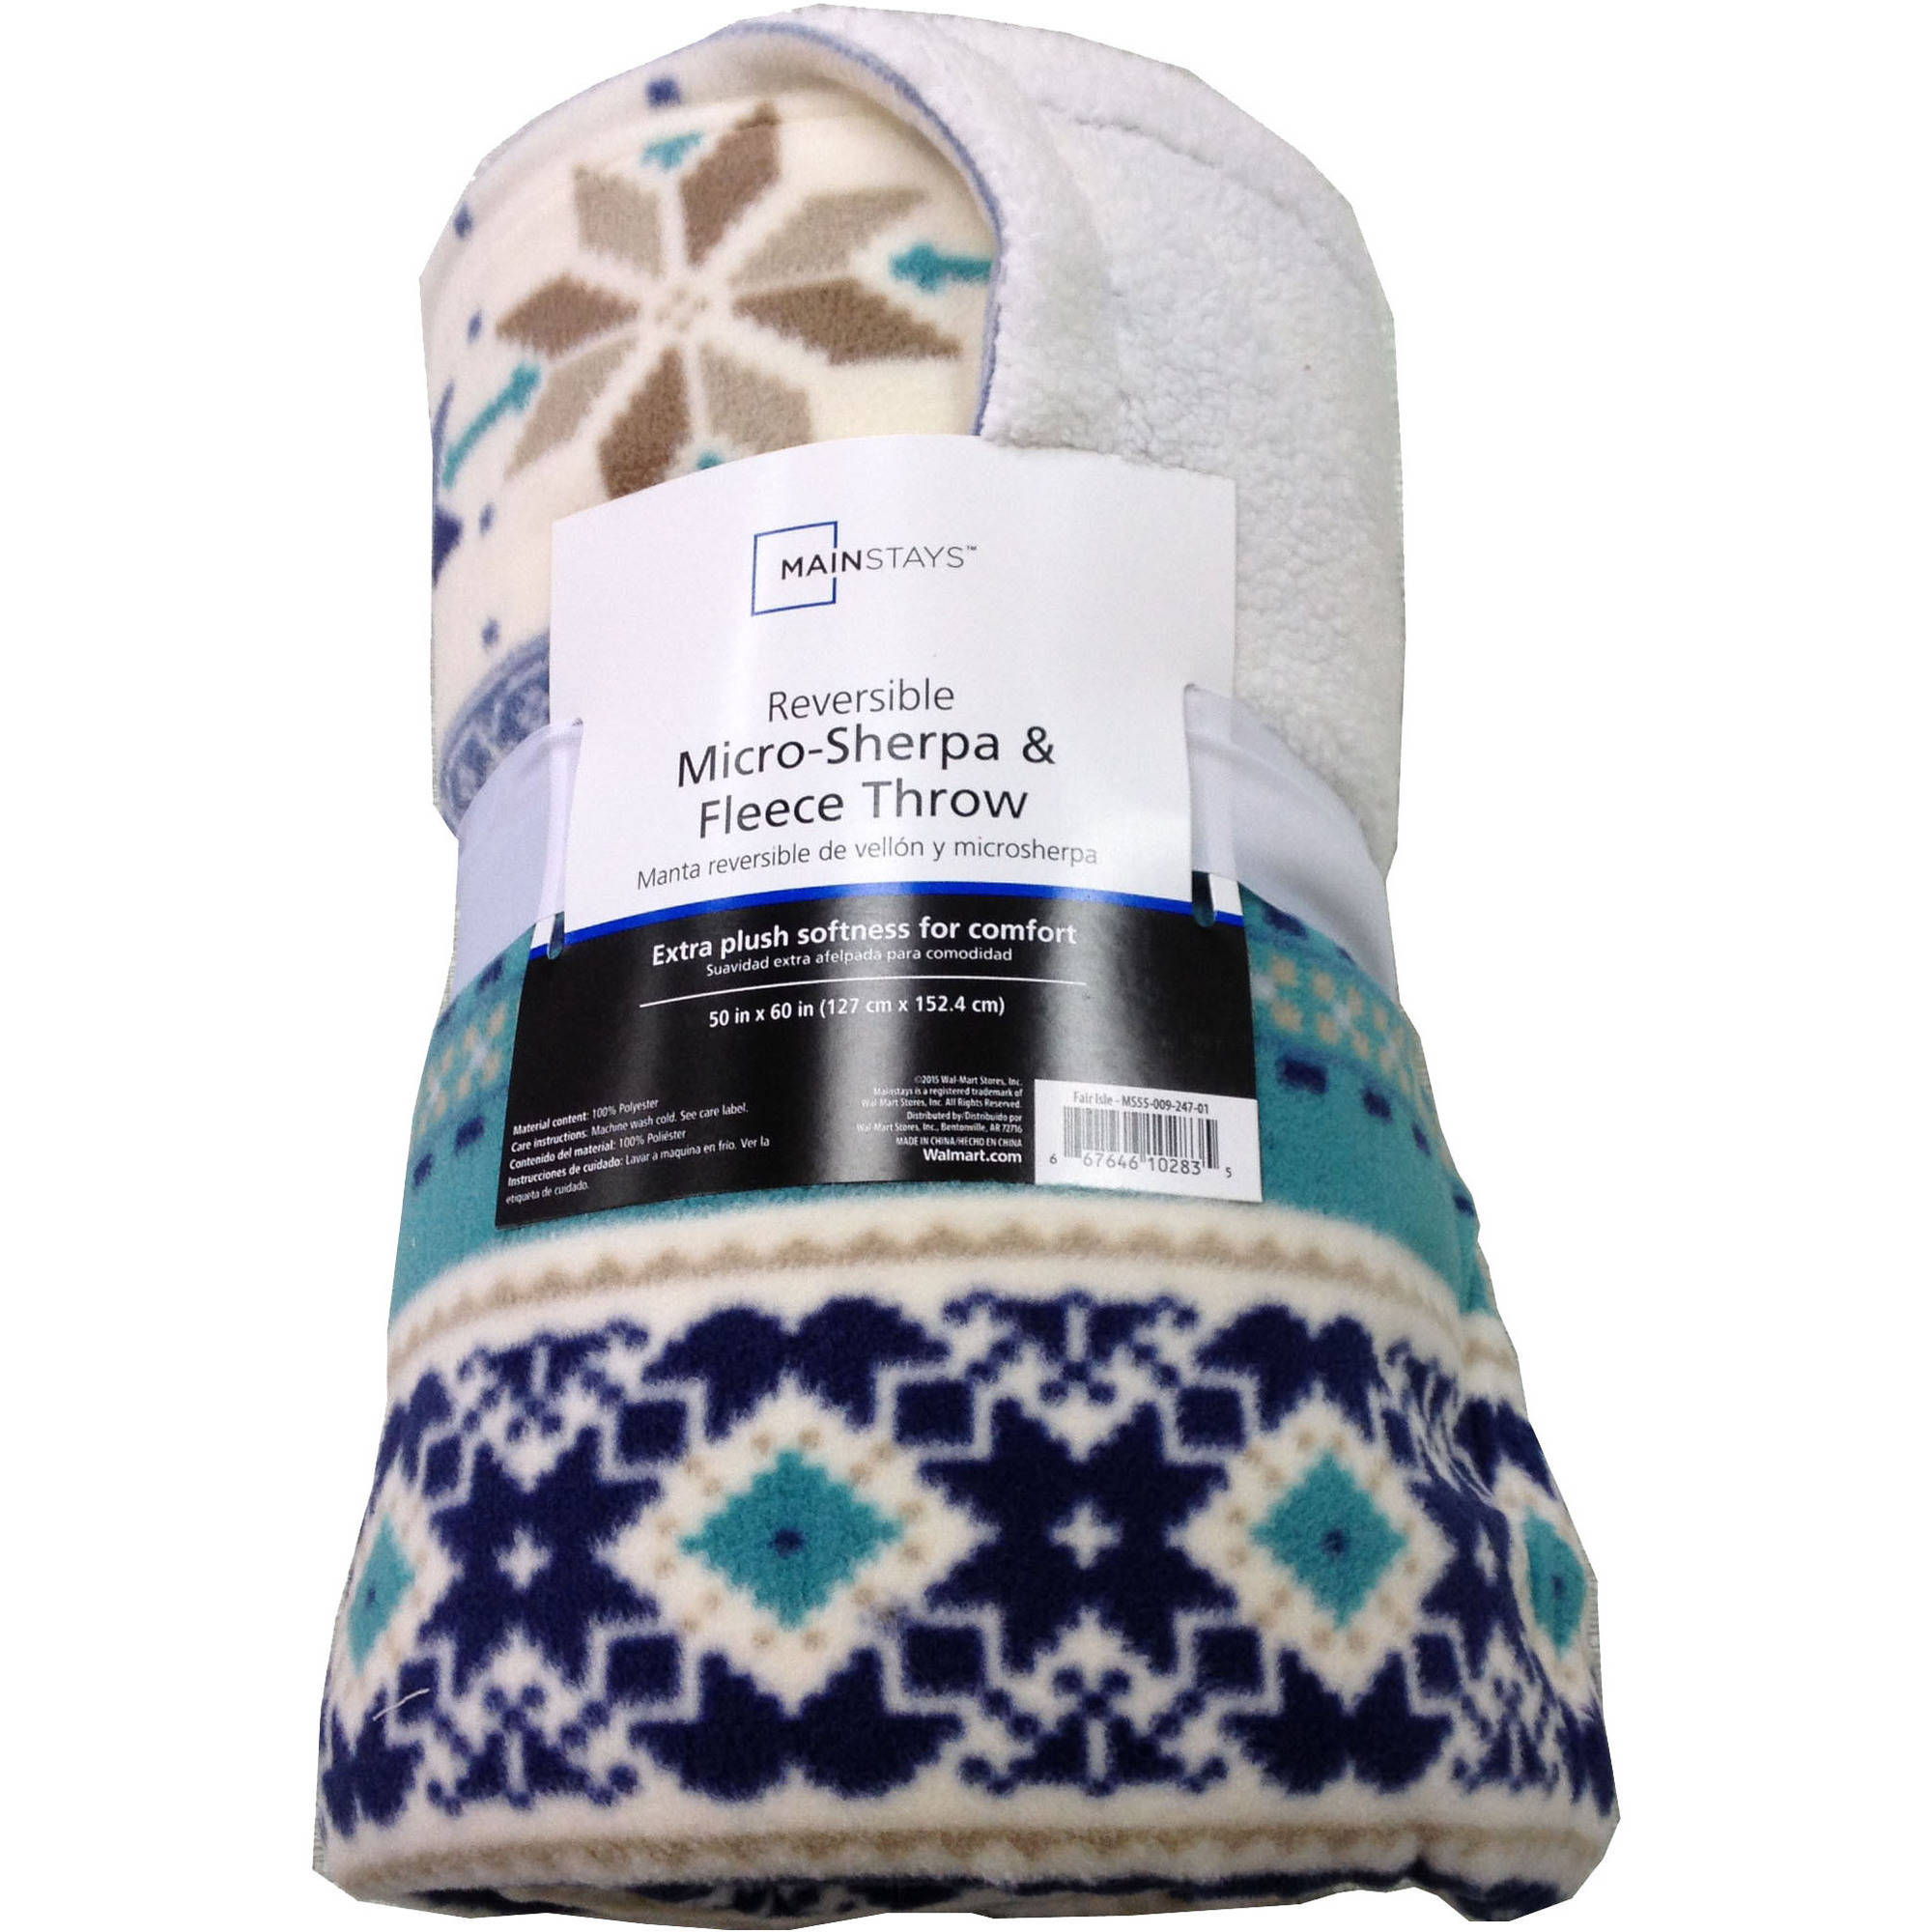 Mainstays Soft & Cozy Fleece to Sherpa Throw Blanket, 1 Each